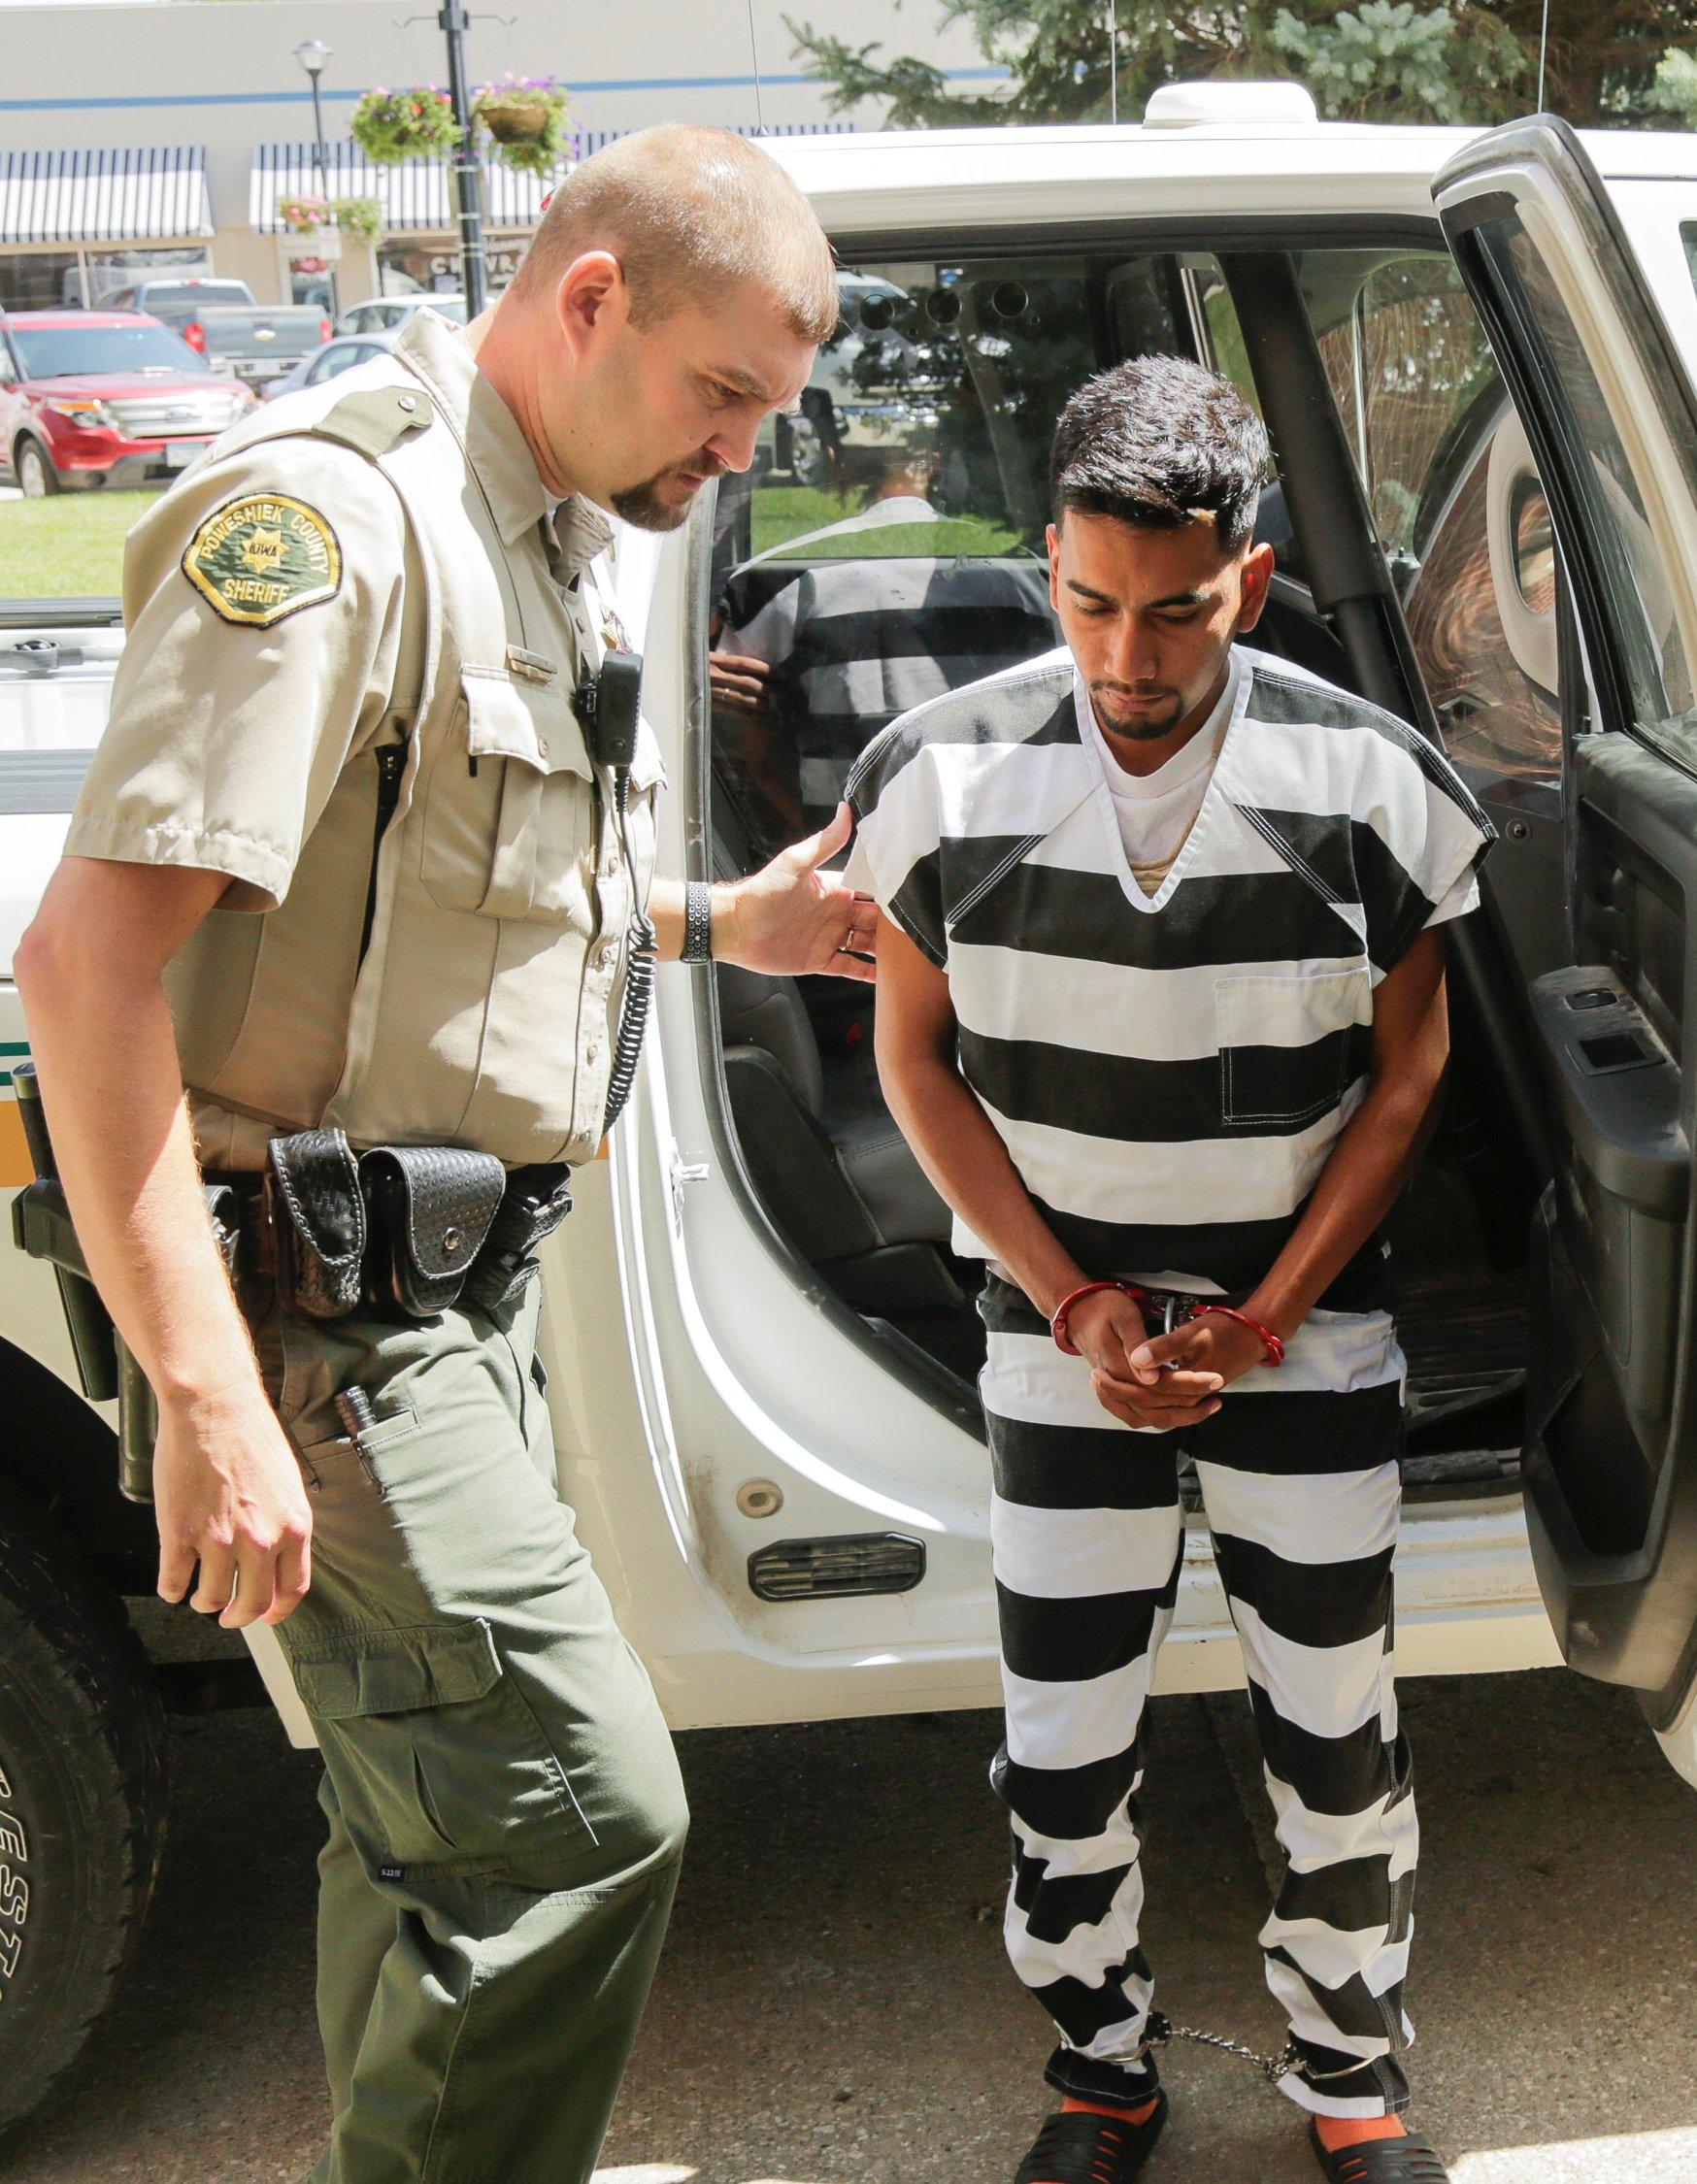 Cristhian Rivera, 24, accused of killing University of Iowa student Mollie Tibbetts, arrives for his initial appearance at the Poweshiek County Courthouse in Montezuma, Iowa, U.S., August 22, 2018. Jim Slosiarek/The Gazette/Pool via REUTERS